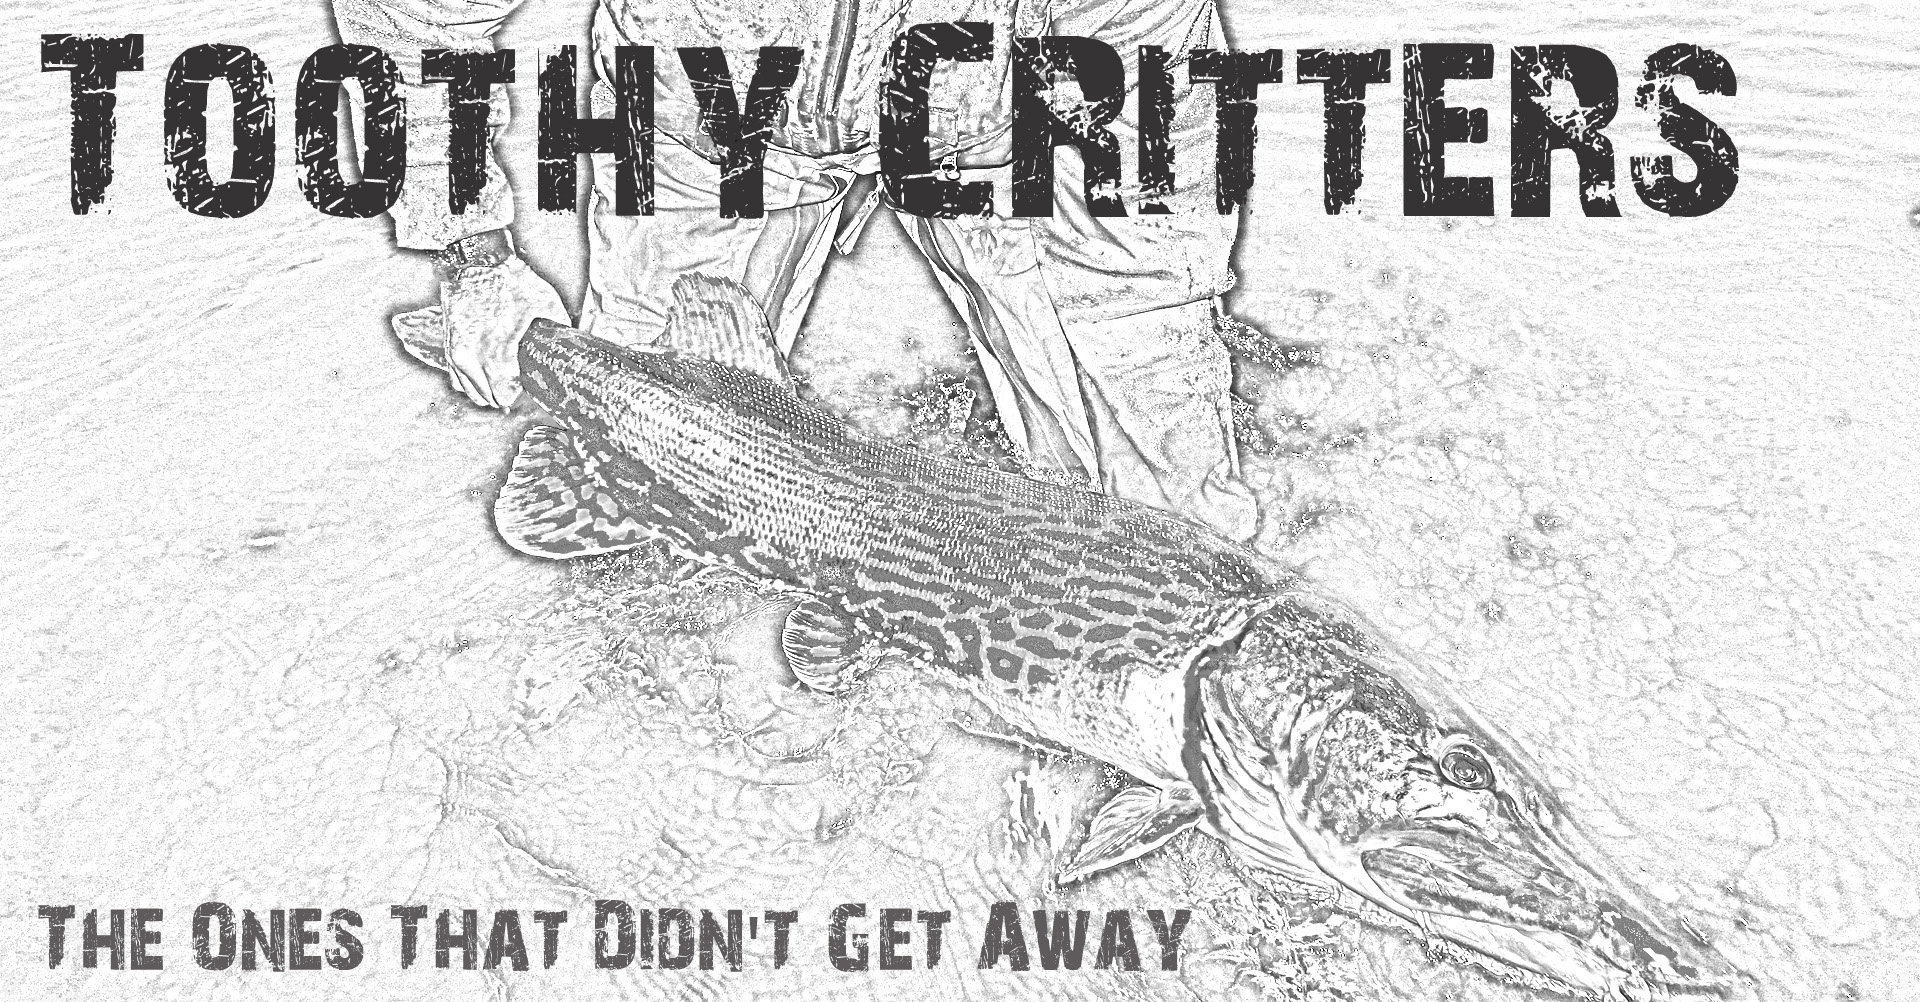 ToohtyCritters